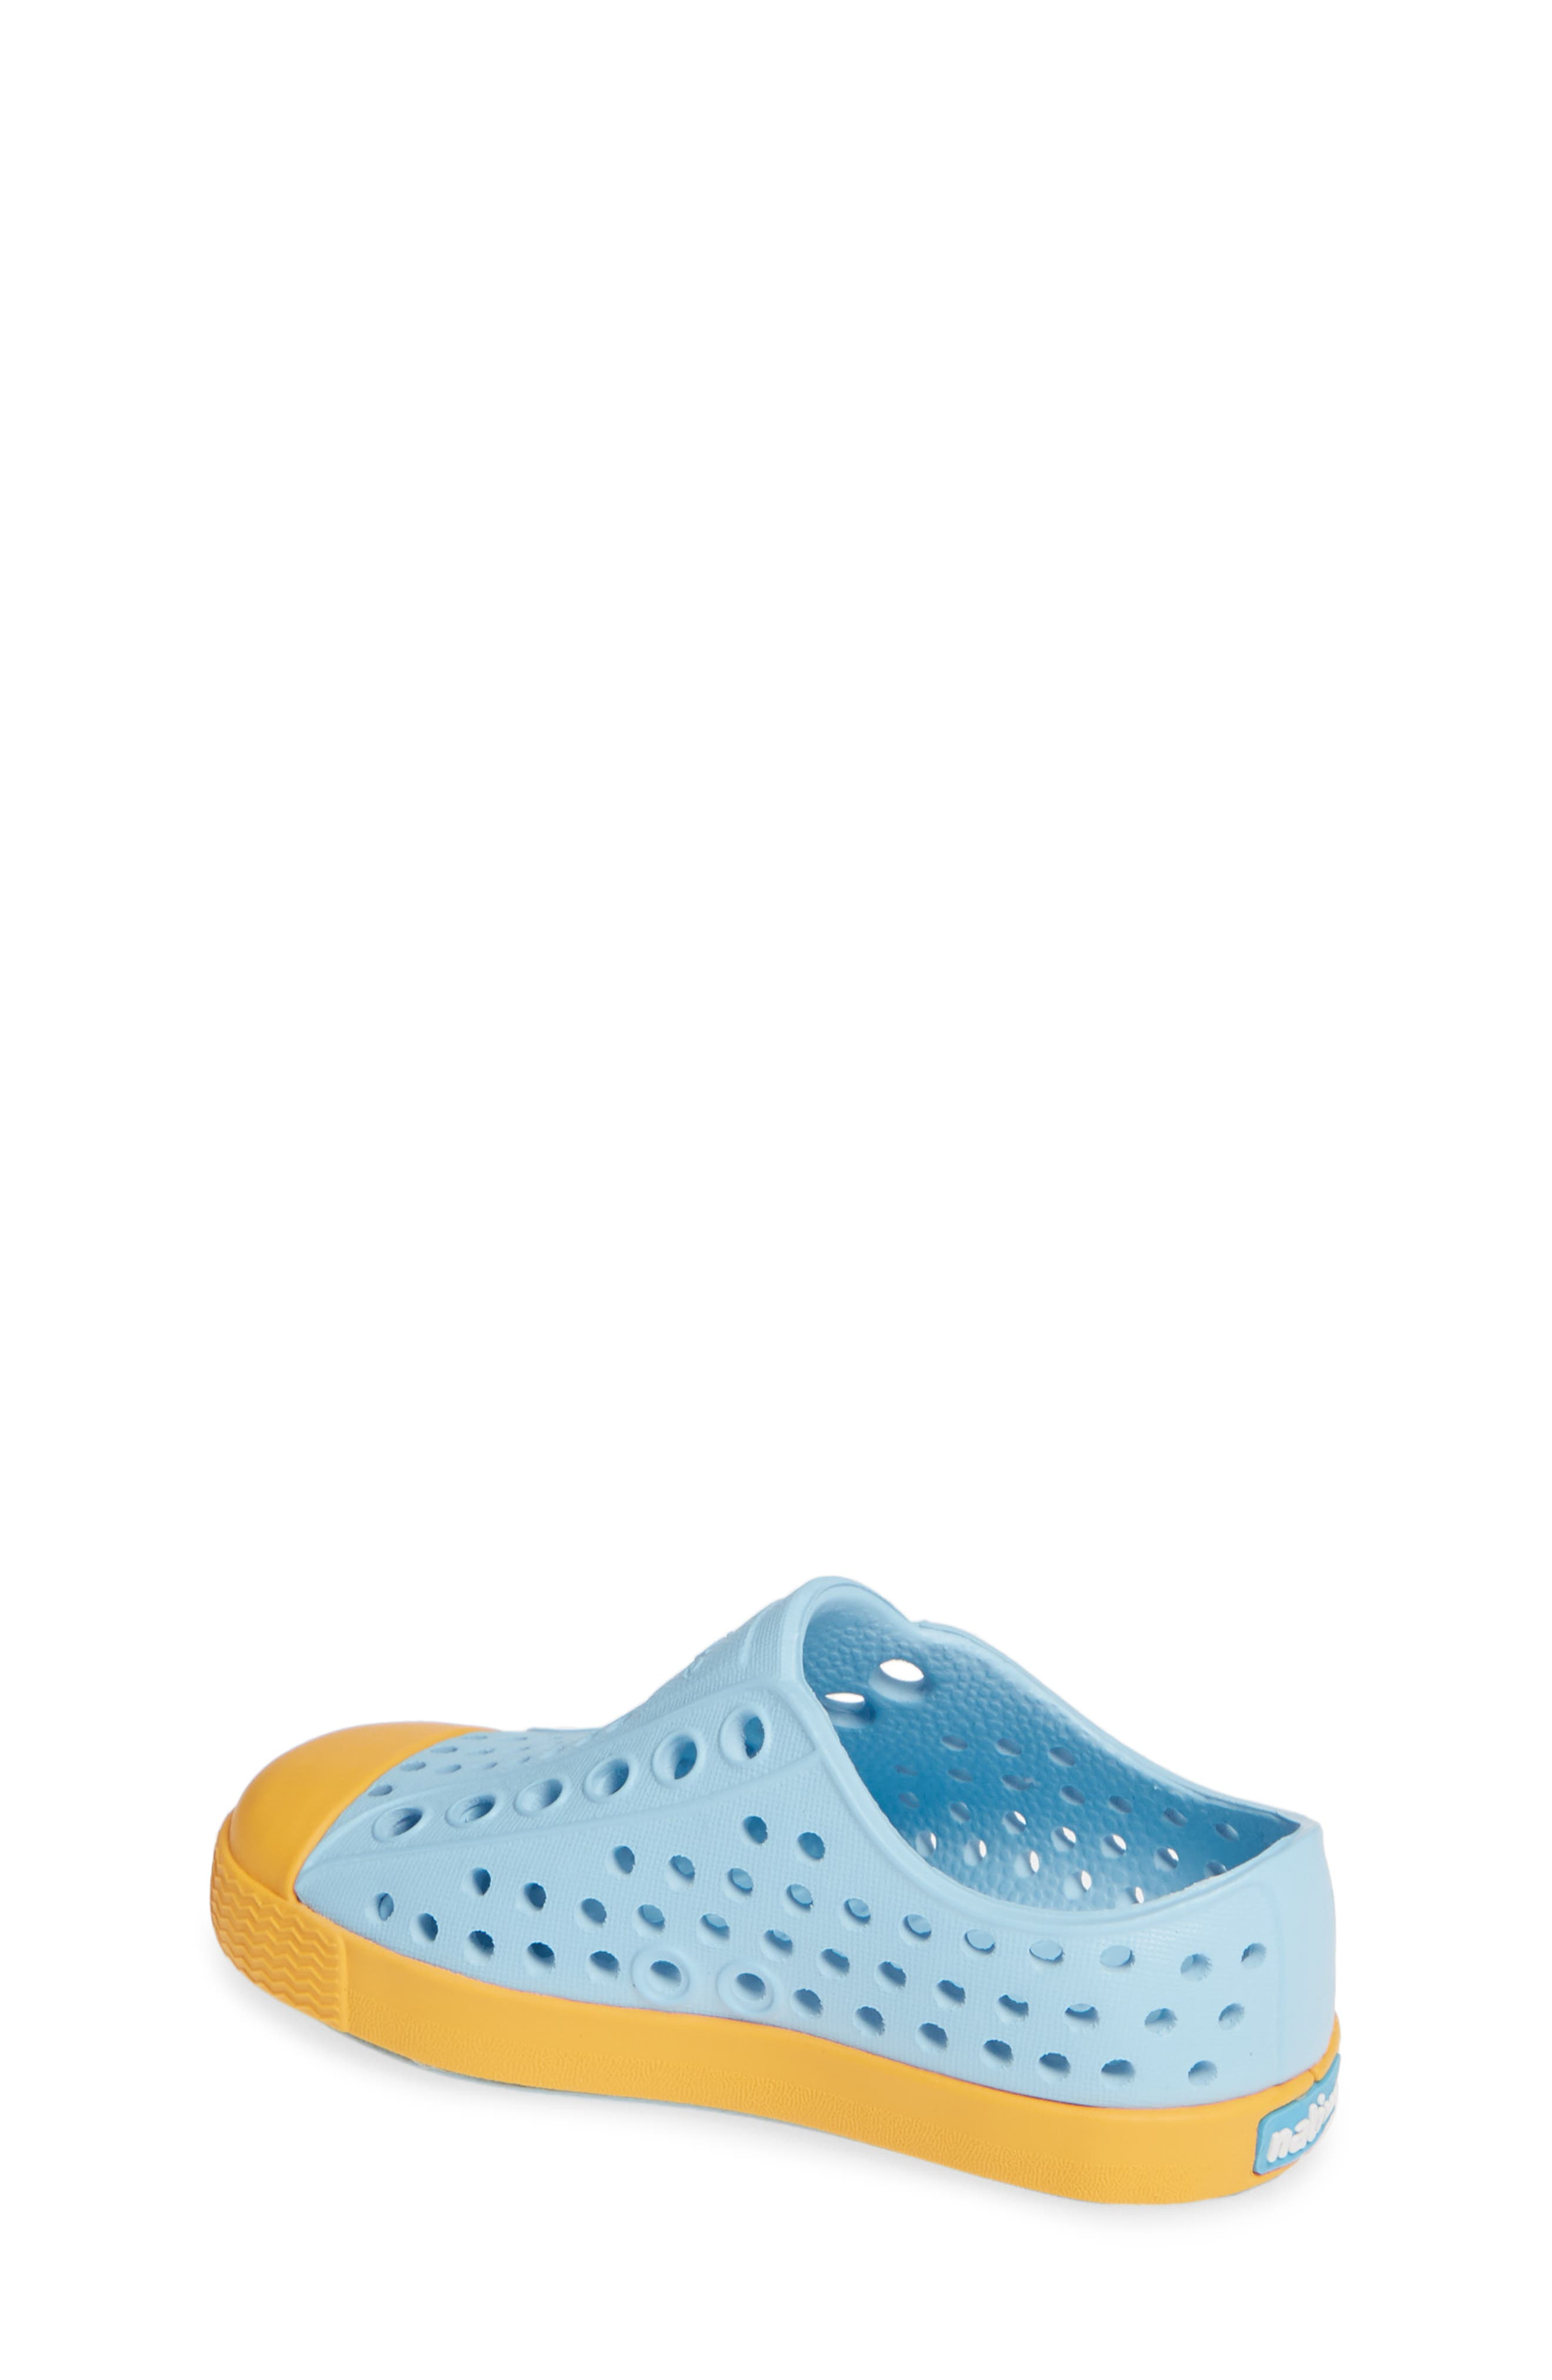 'Jefferson' Water Friendly Slip-On Sneaker,                             Alternate thumbnail 77, color,